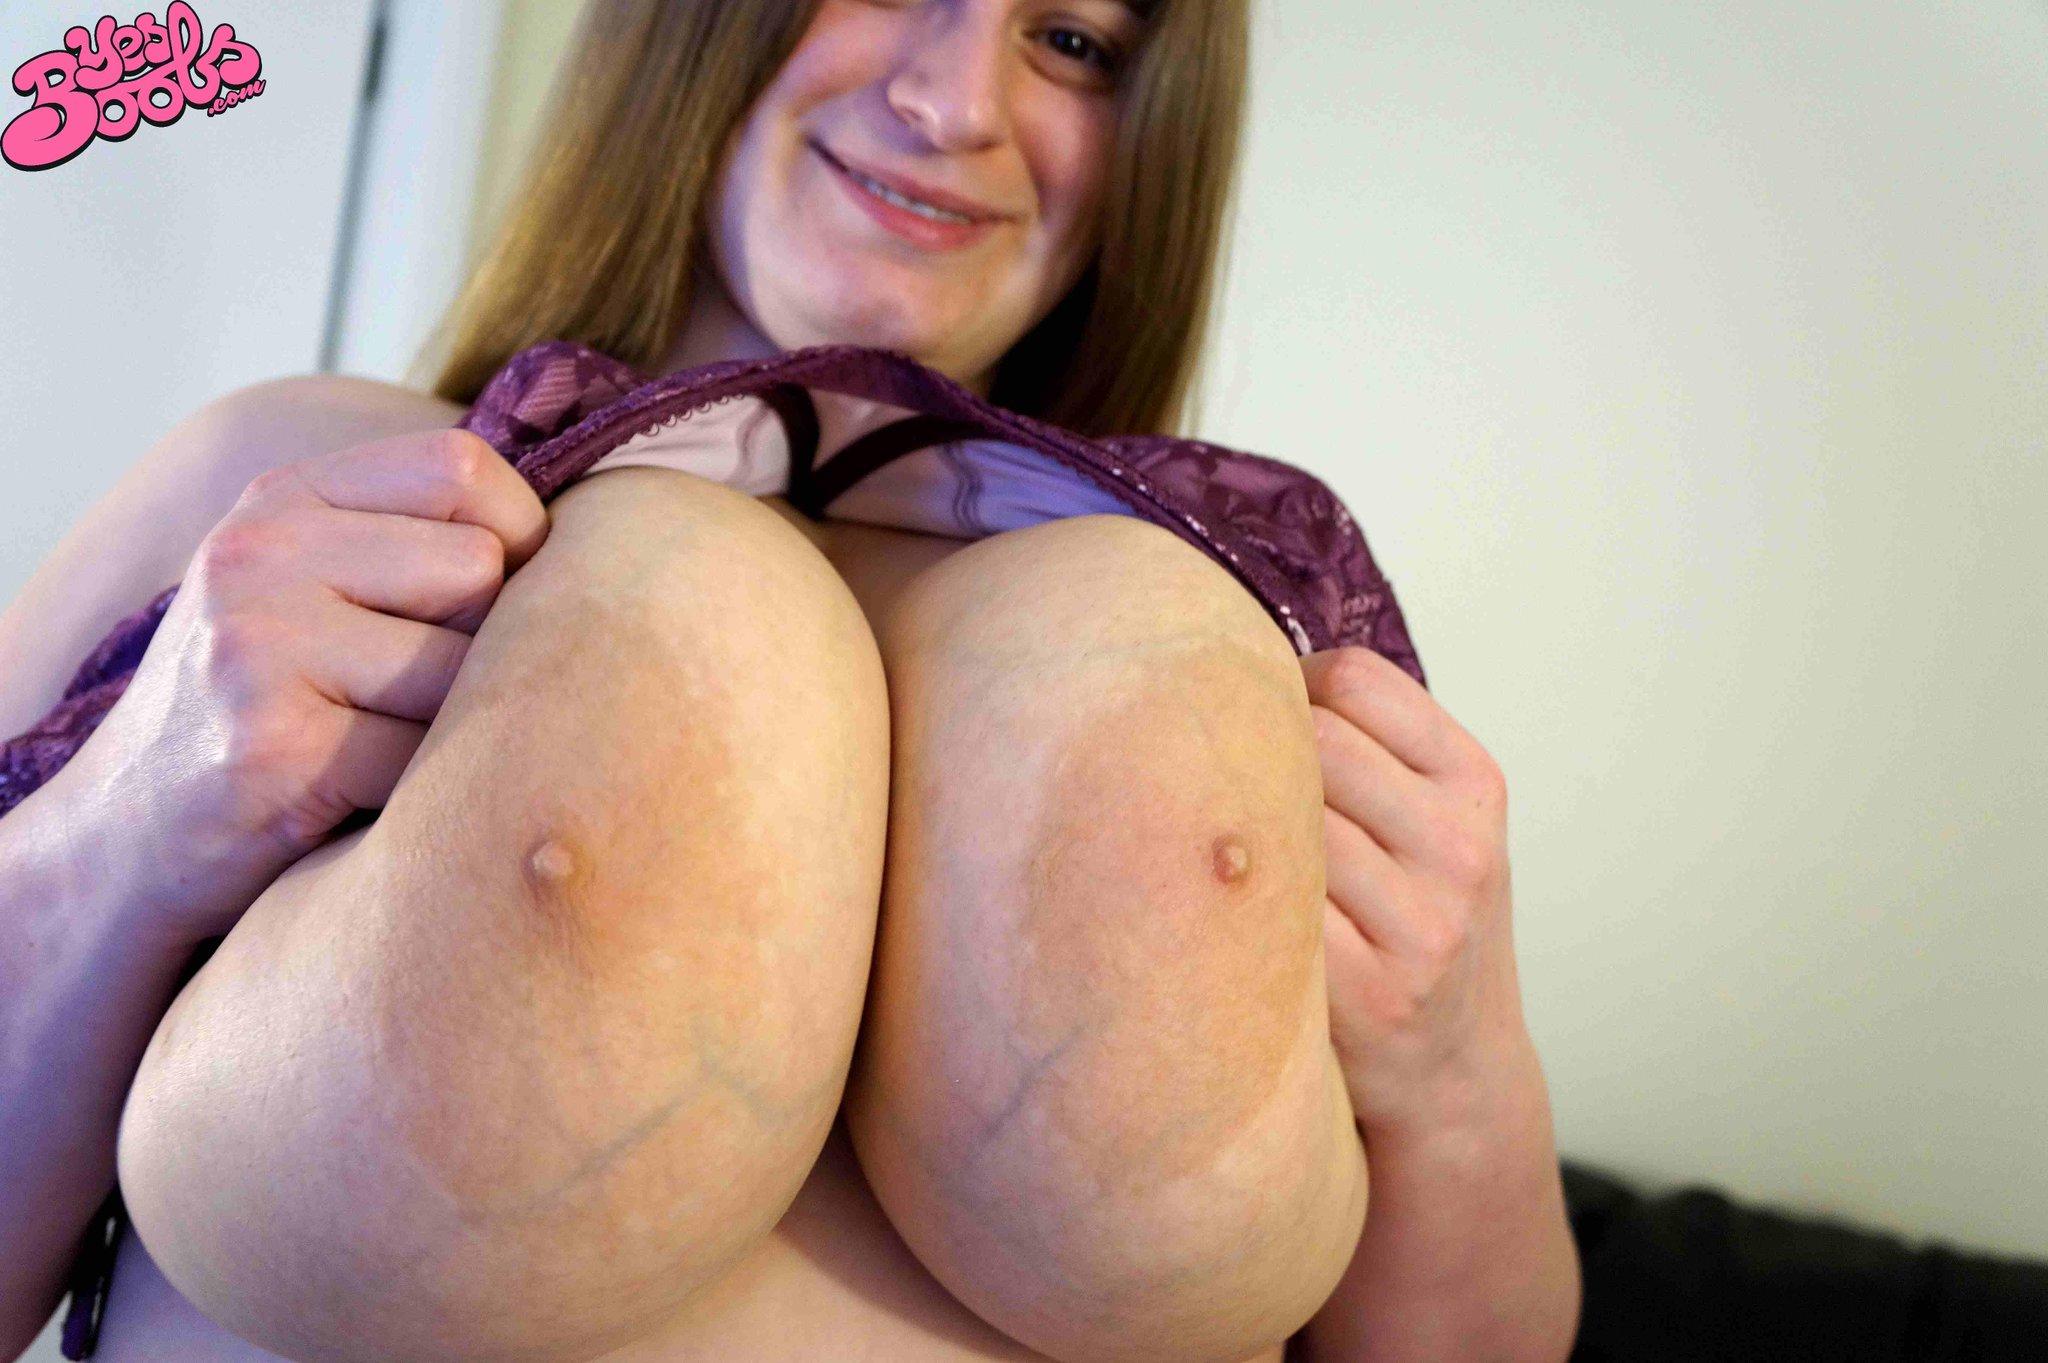 Sarah rae big boobs bugil for the